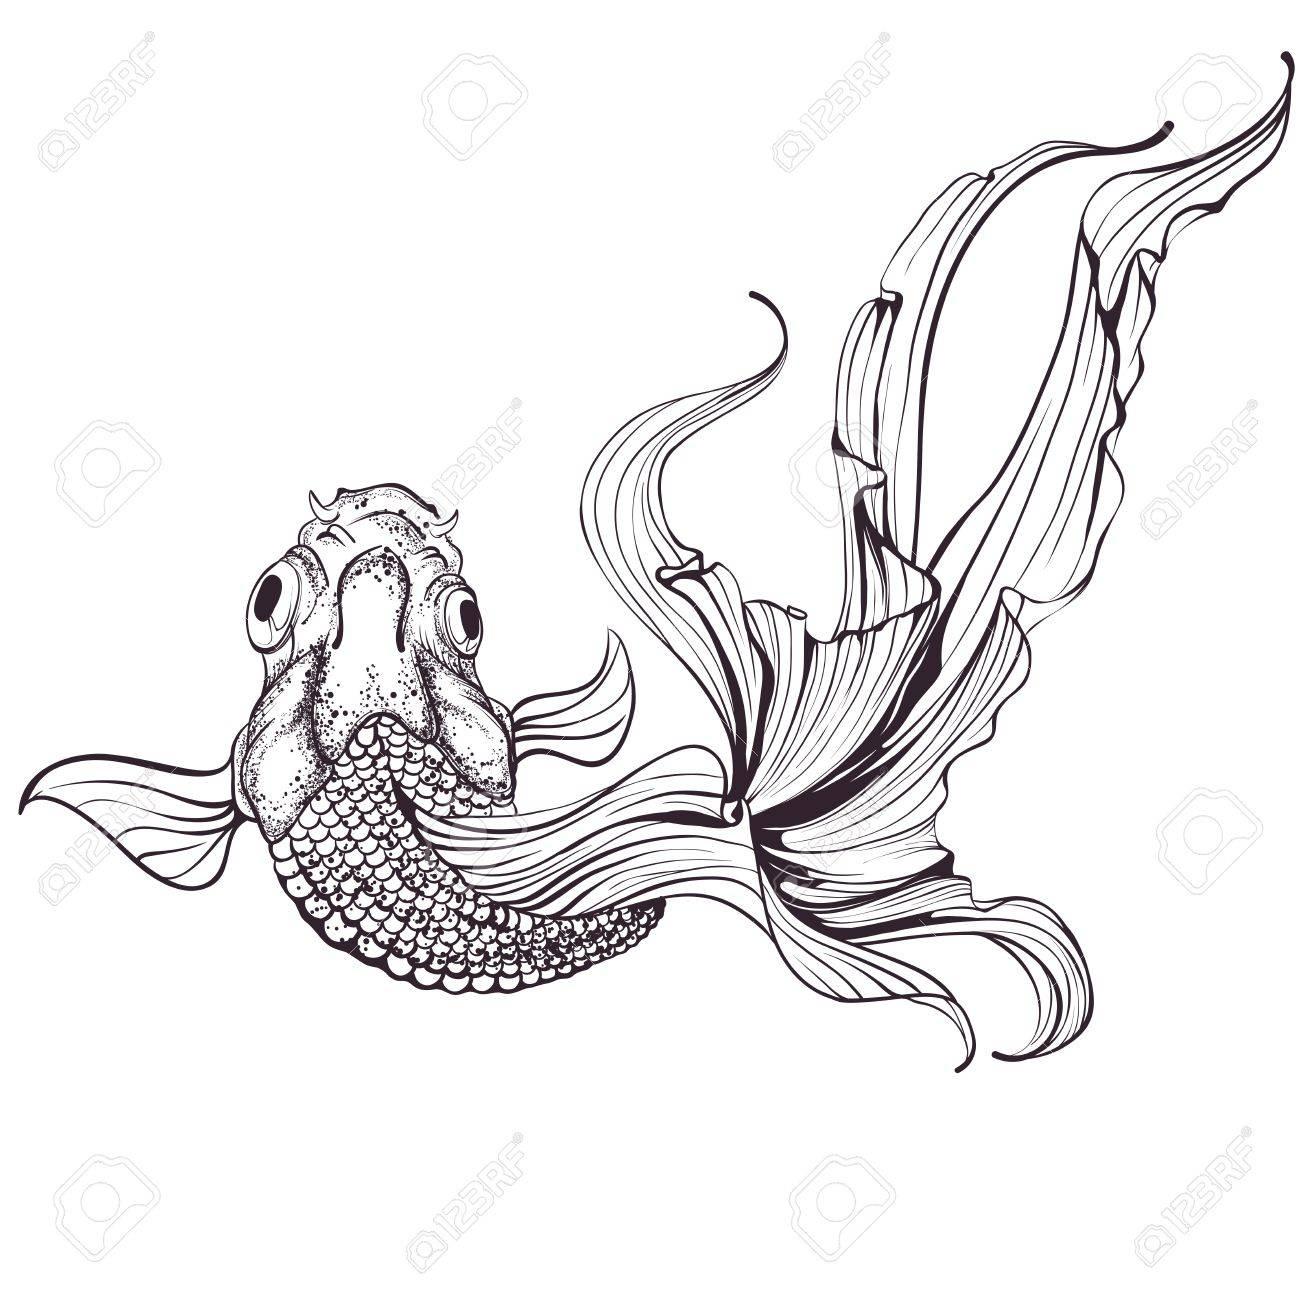 Goldfish sketch on white background - 21563437